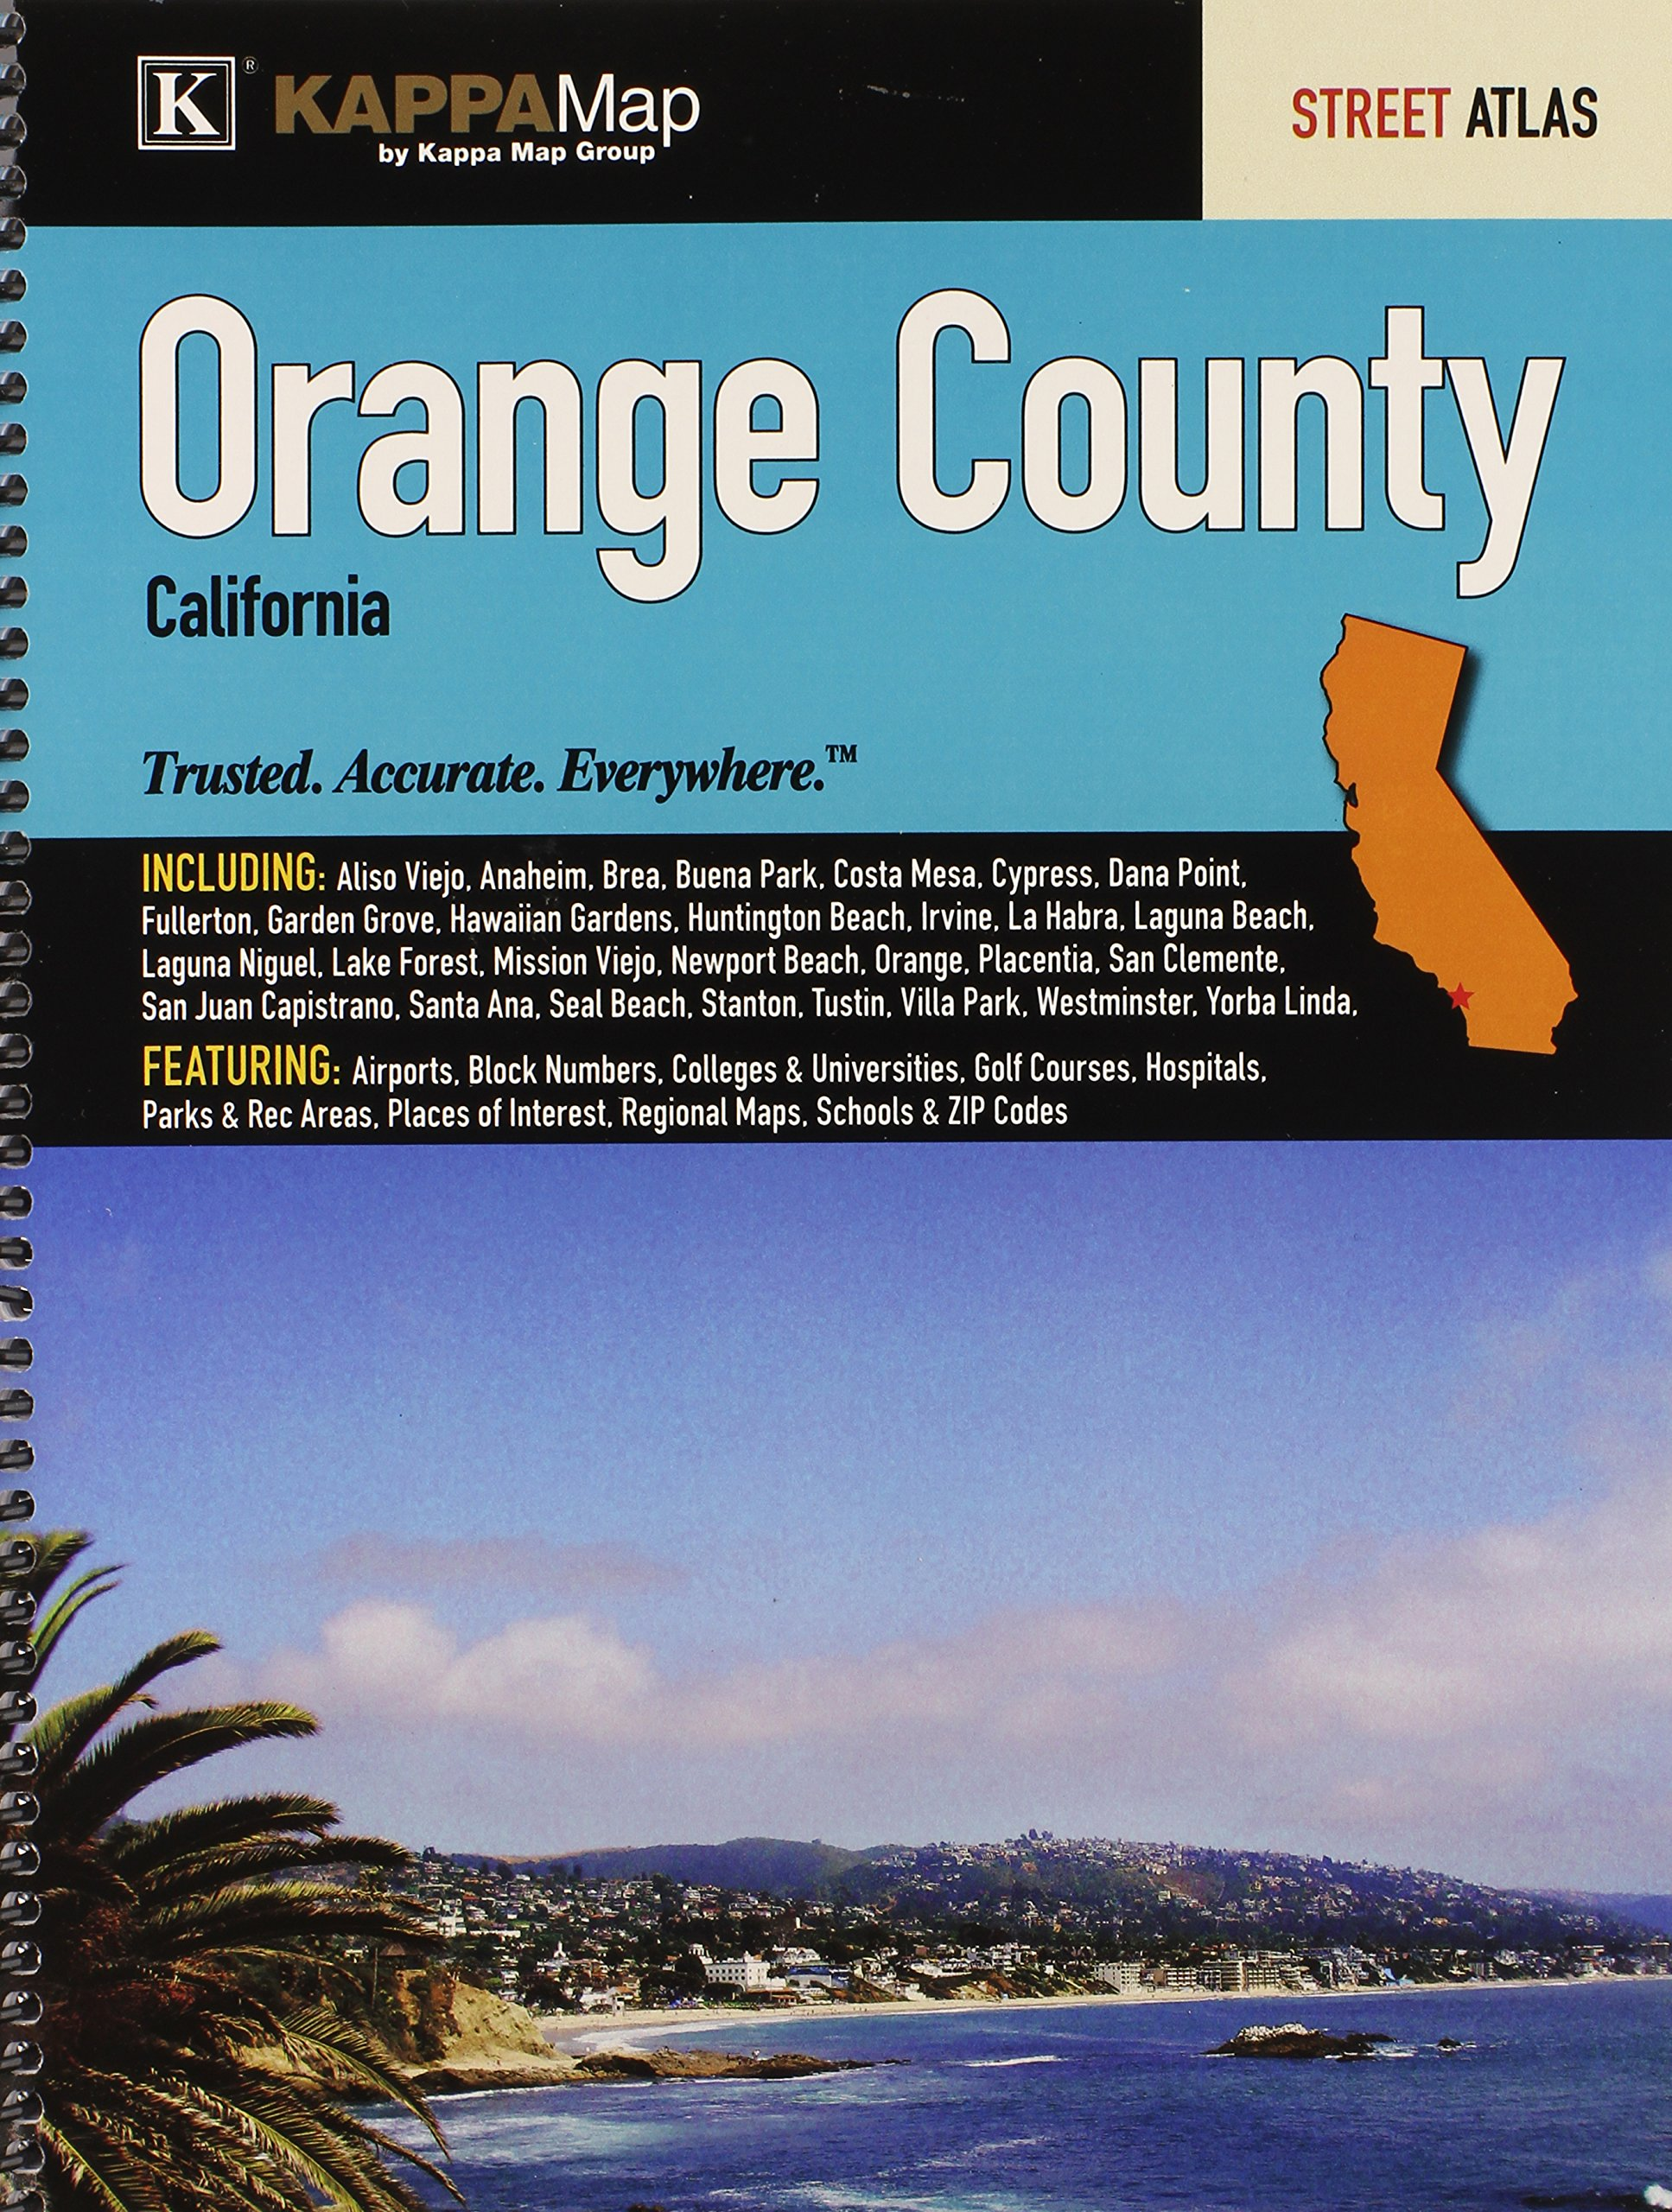 Orange County, CA Street Atlas: Kappa Map Group ... on orange county california map, flagstaff california map, atwater village california map, california california map, antioch california map, artois california map, burson california map, carmel by the sea california map, olive california map, bodfish california map, cardiff by the sea california map, azusa california map, all of california cities map, boyle heights california map, farmington california map, cherry valley california map, kenmore california map, waterville california map, casmalia california map, hillsboro california map,